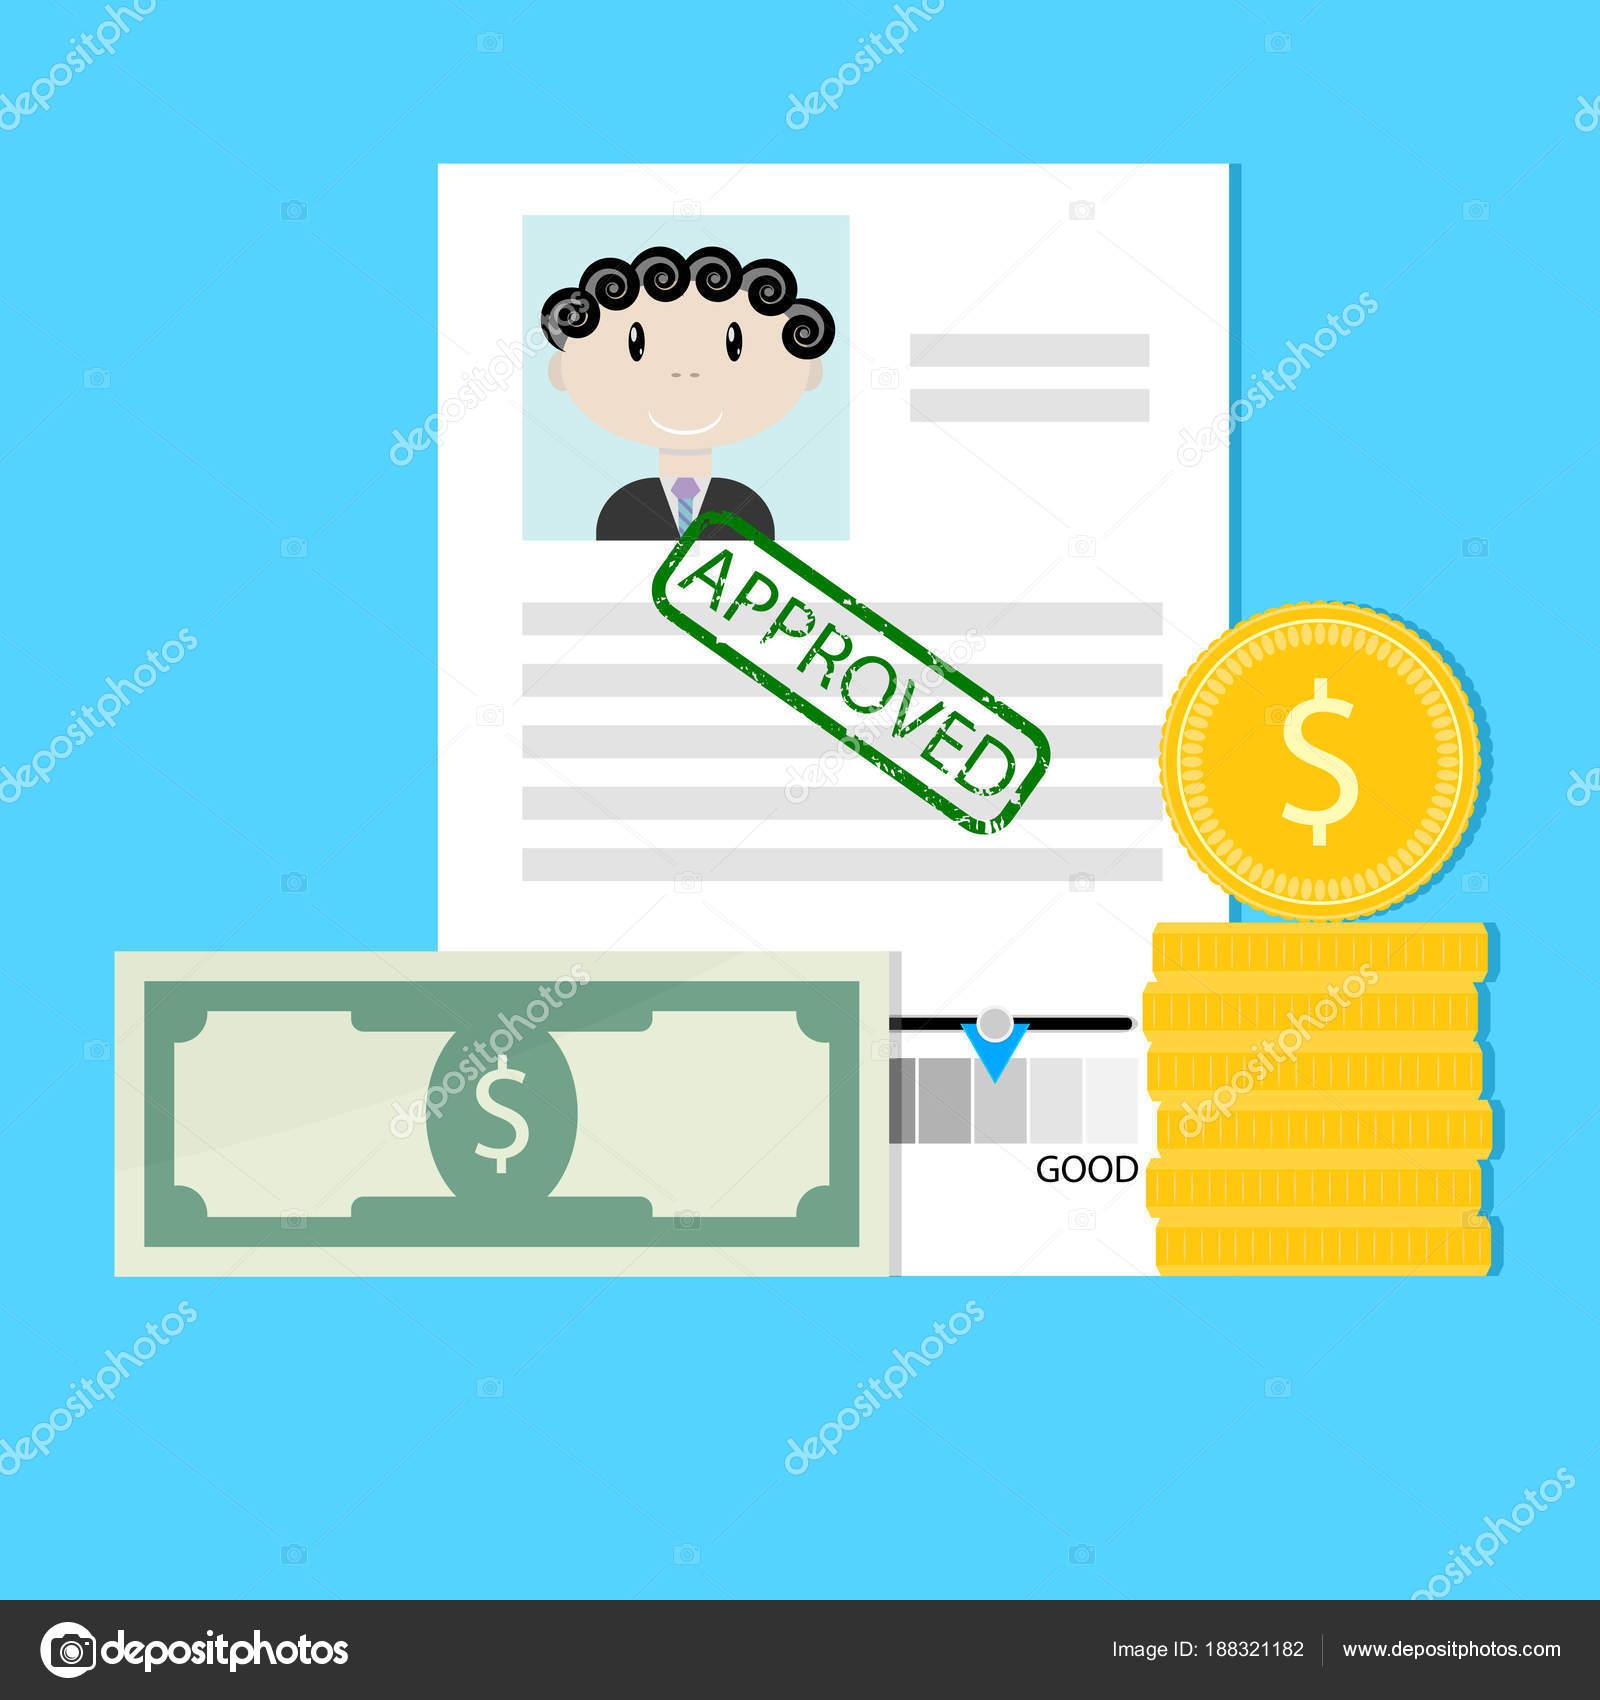 Finanz Kredit genehmigt — Stockvektor © 09910190 #188321182